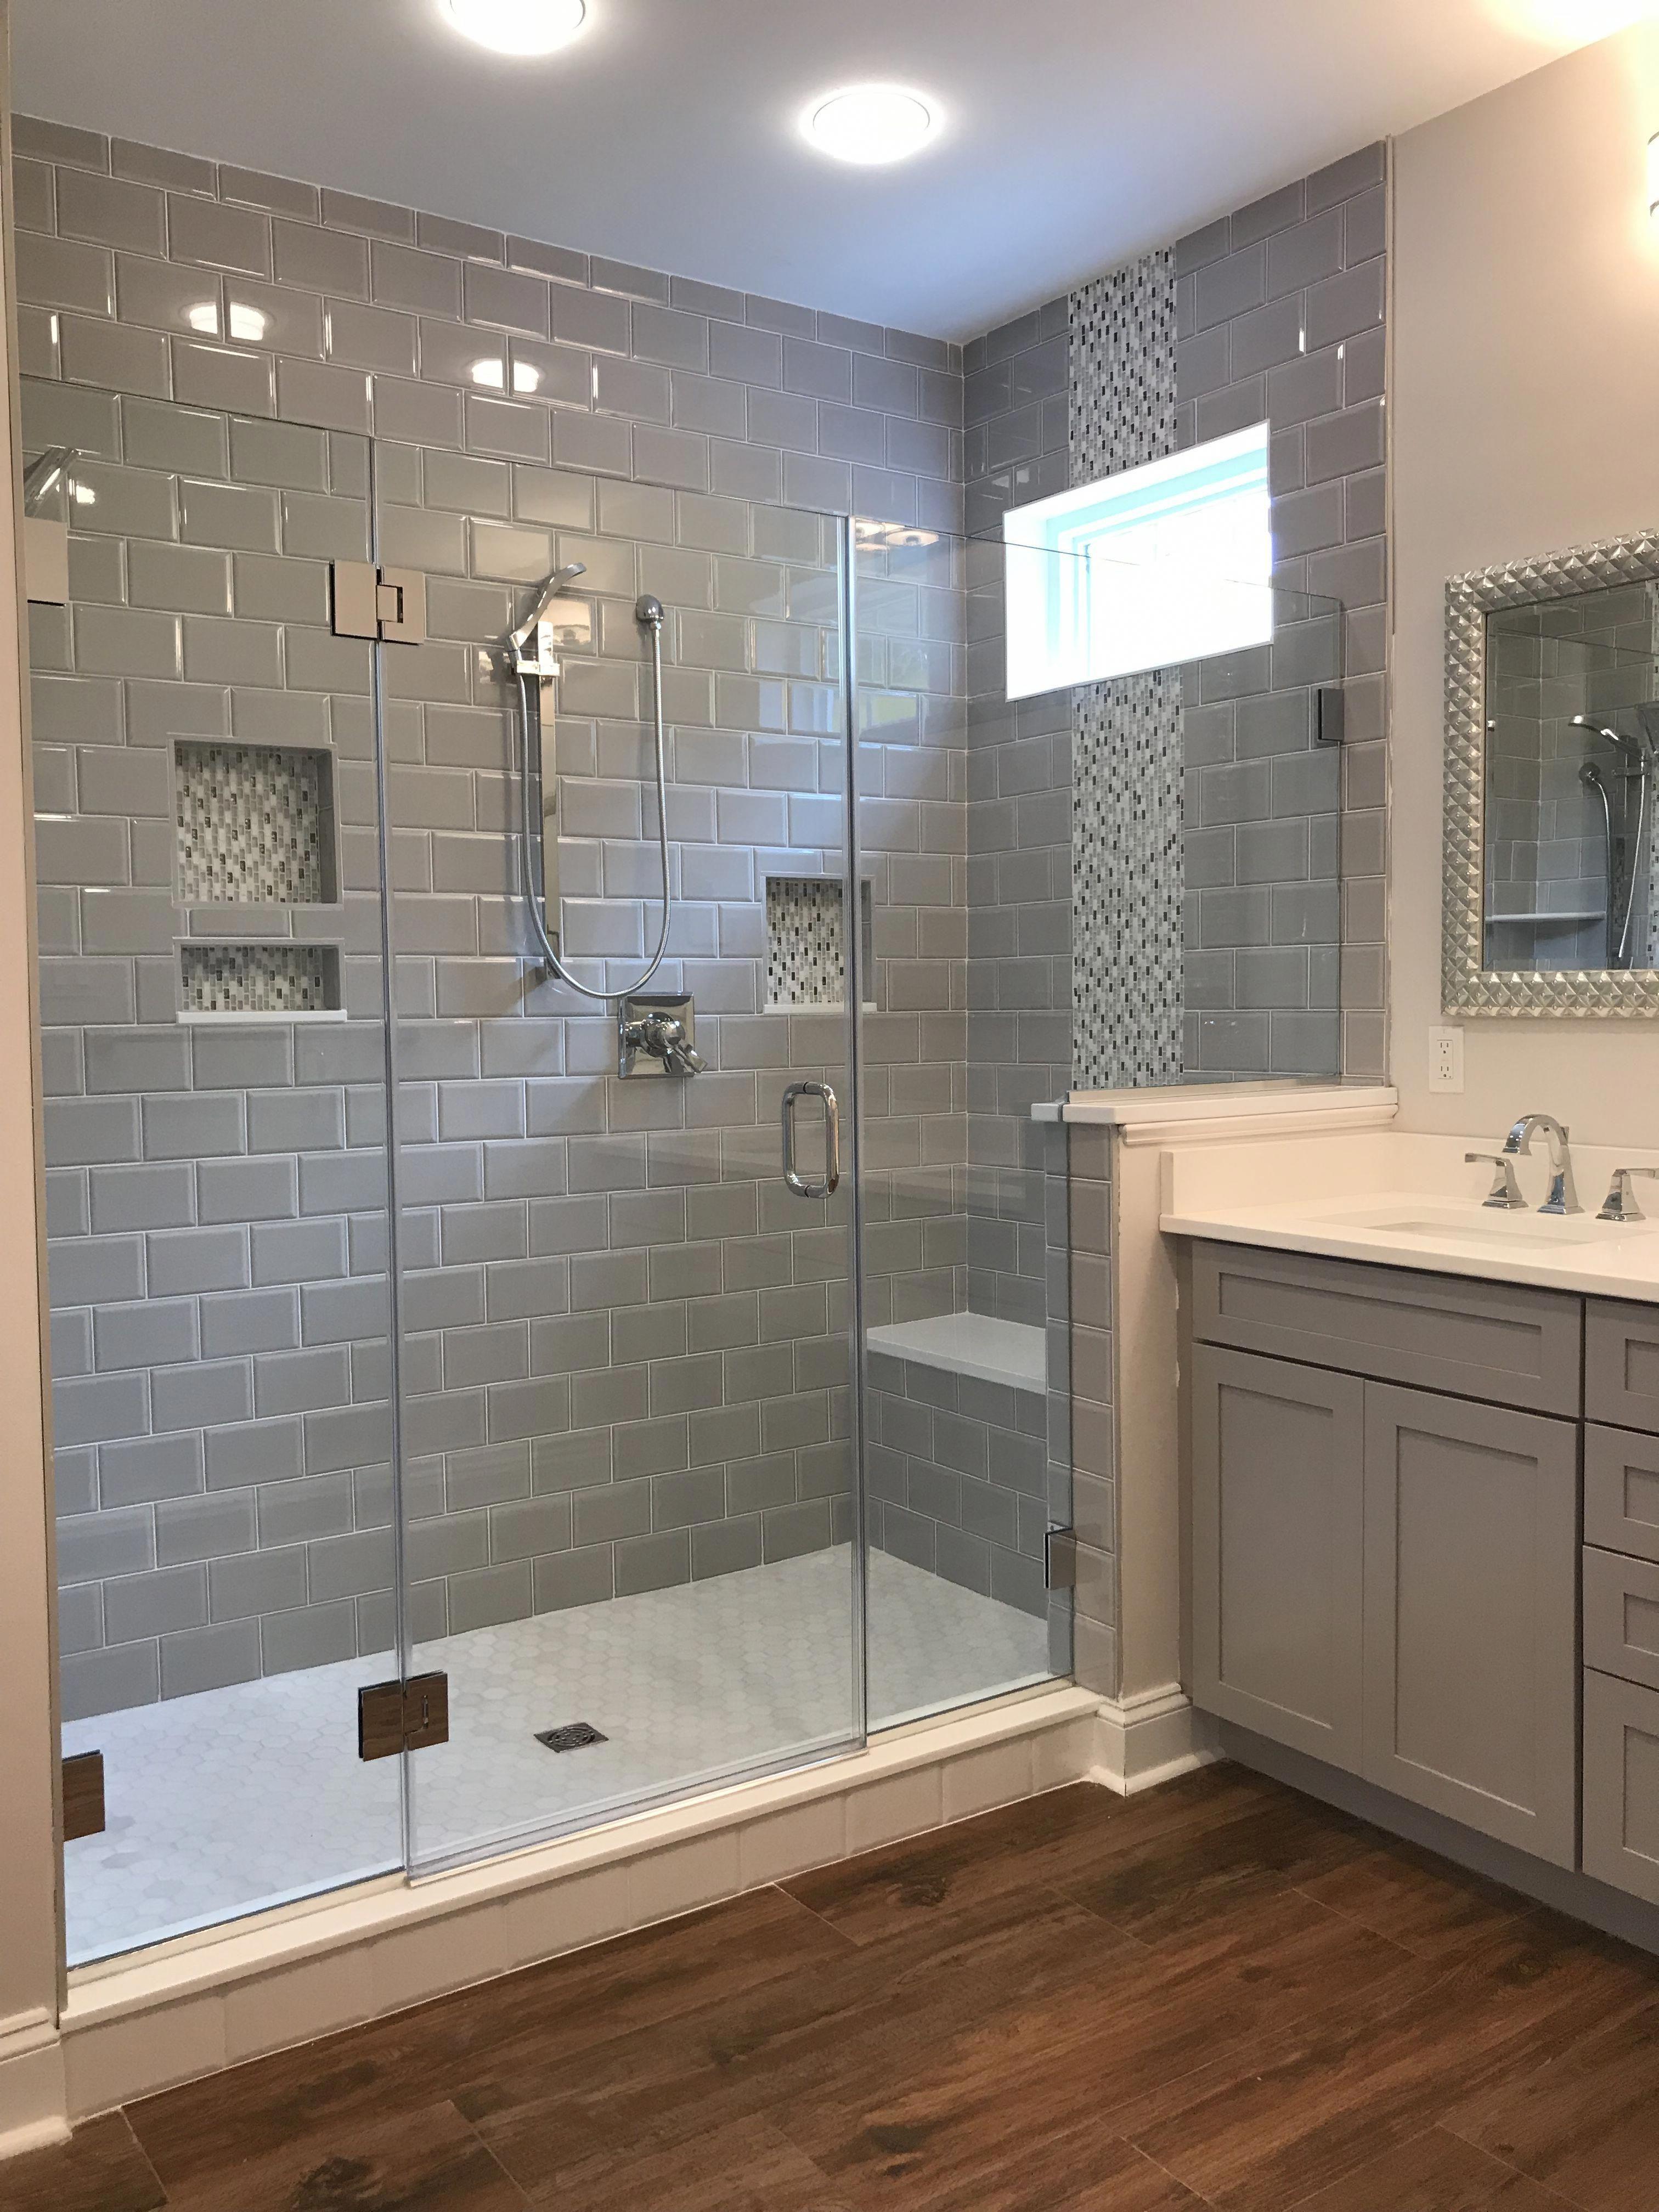 Wood Panel Look Alike Tile Inside This Shower Design Albert David Design Inc Wood Tile Shower Shower Tile Bathroom Shower Panels